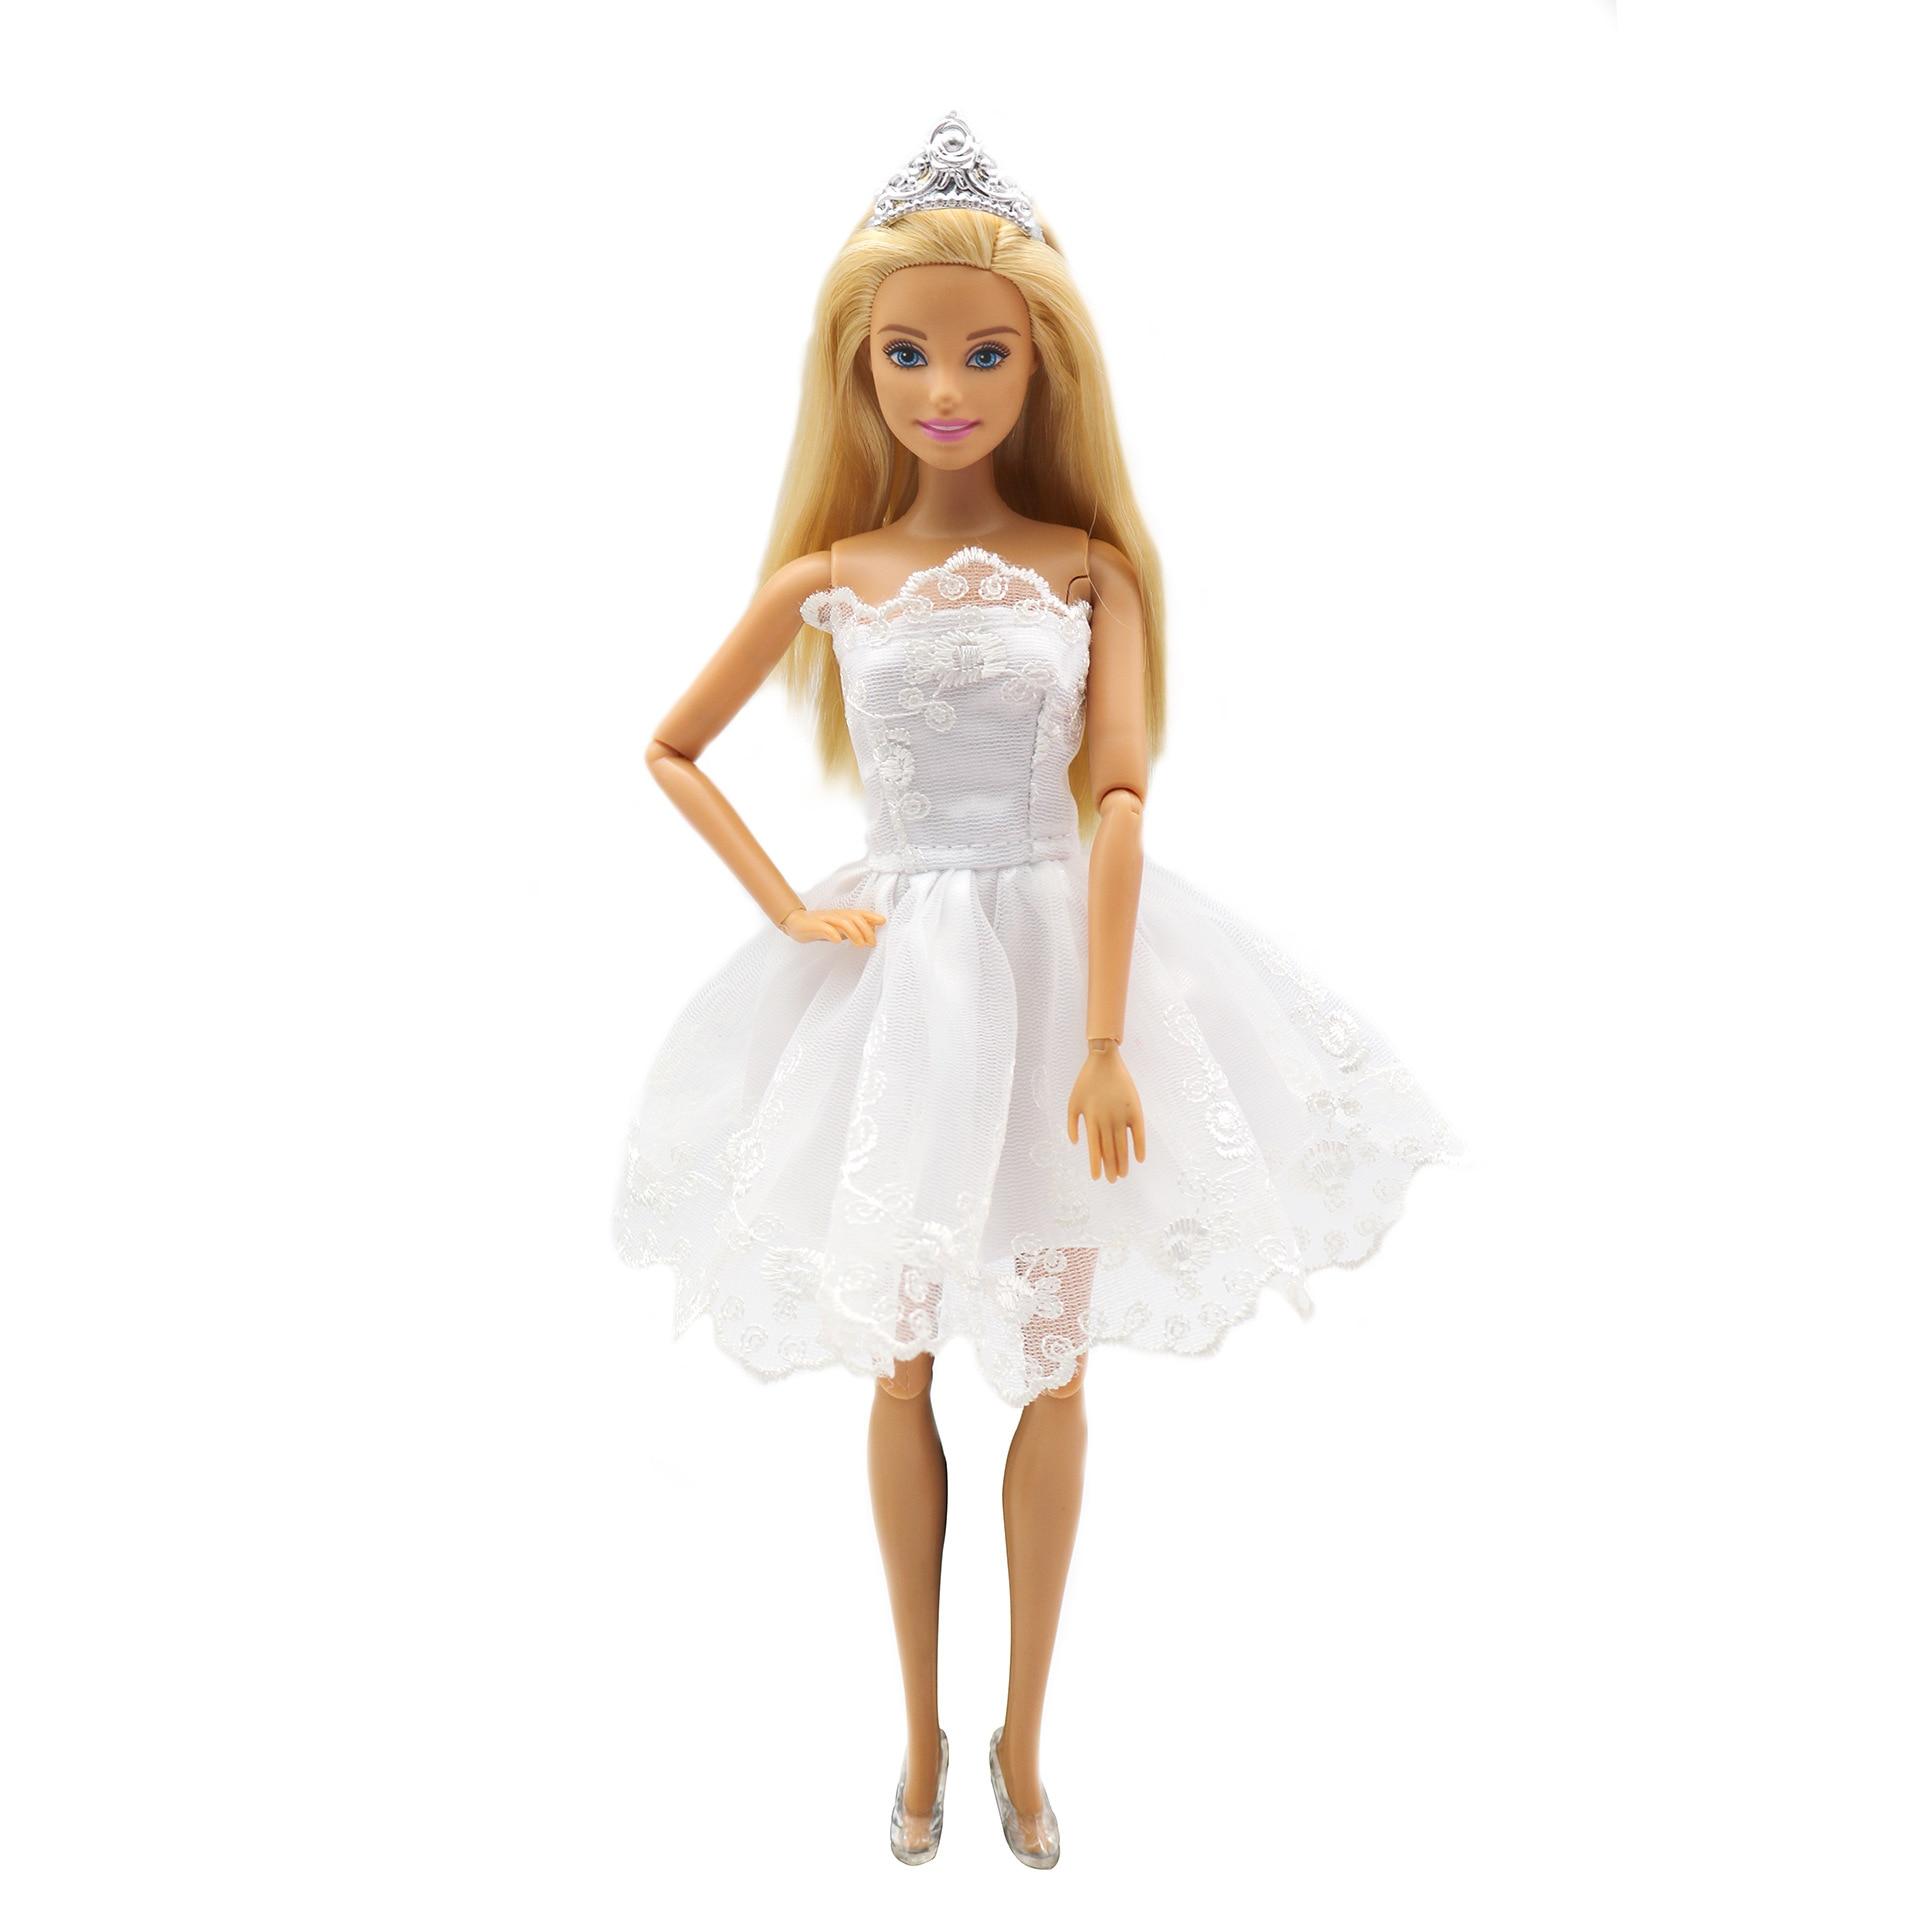 Branco princesa vestido bjd boneca roupas para barbie acessórios jogar casa vestir-se